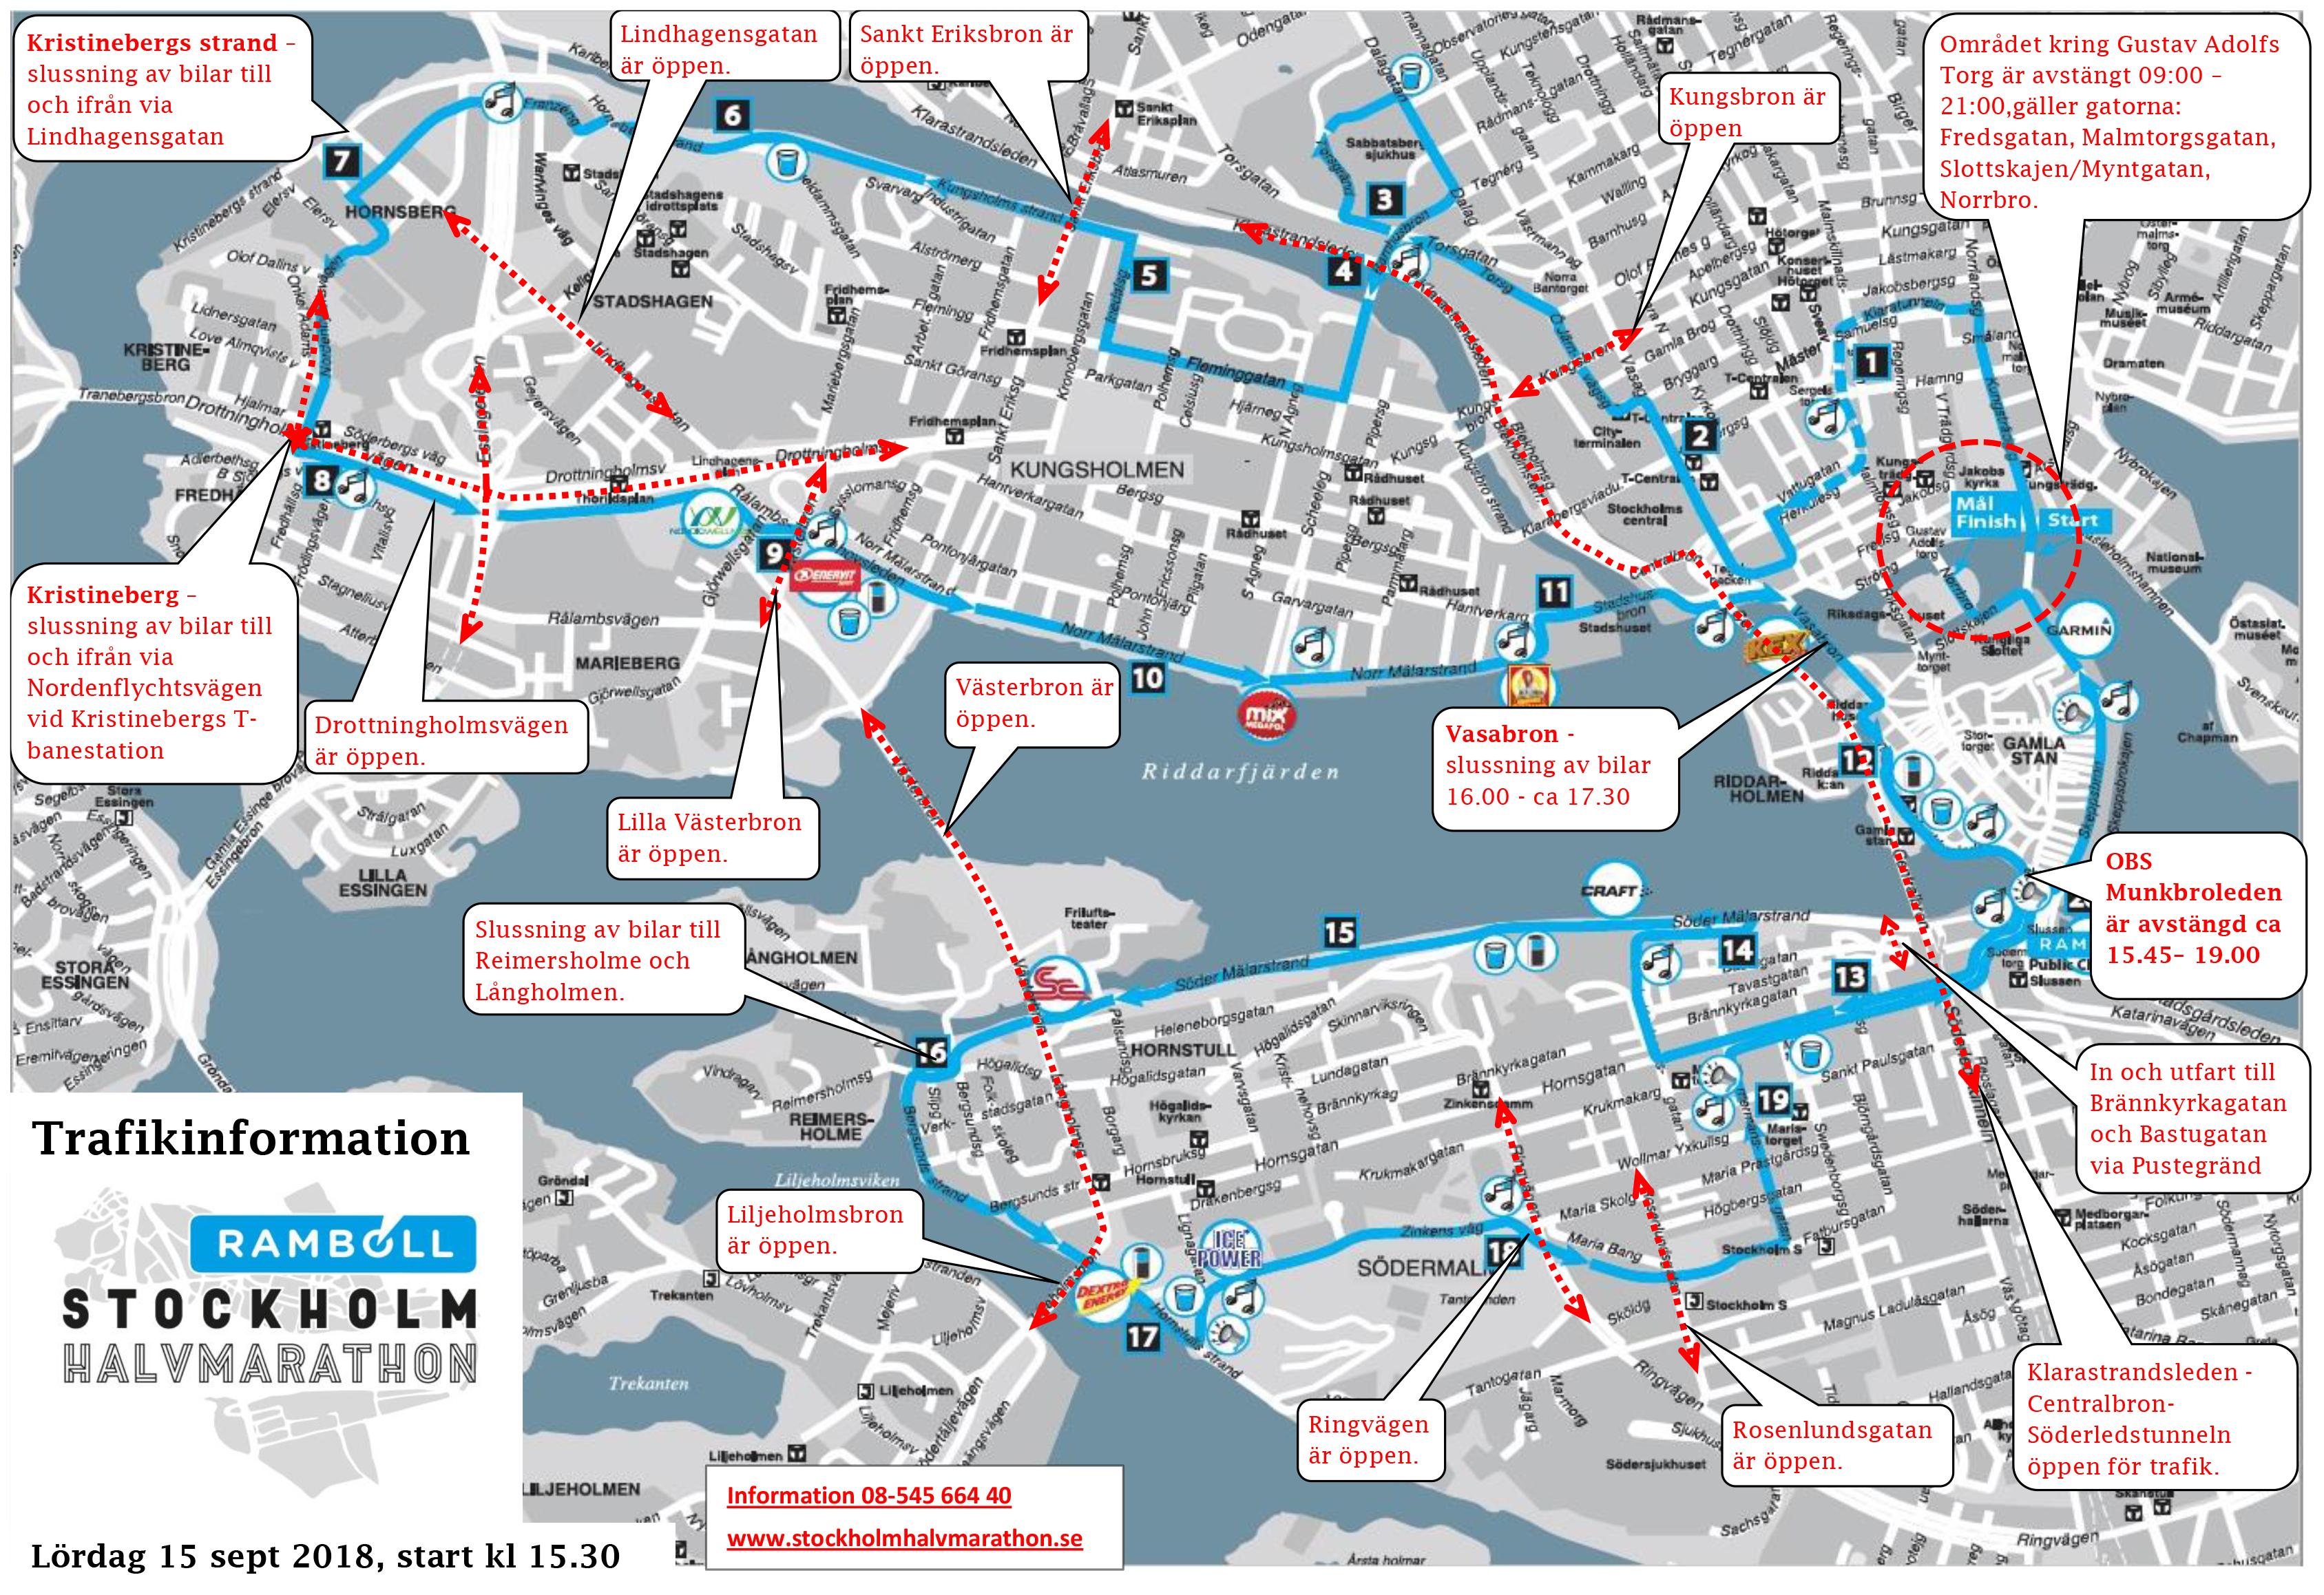 Stockholm halvmarathon resultat